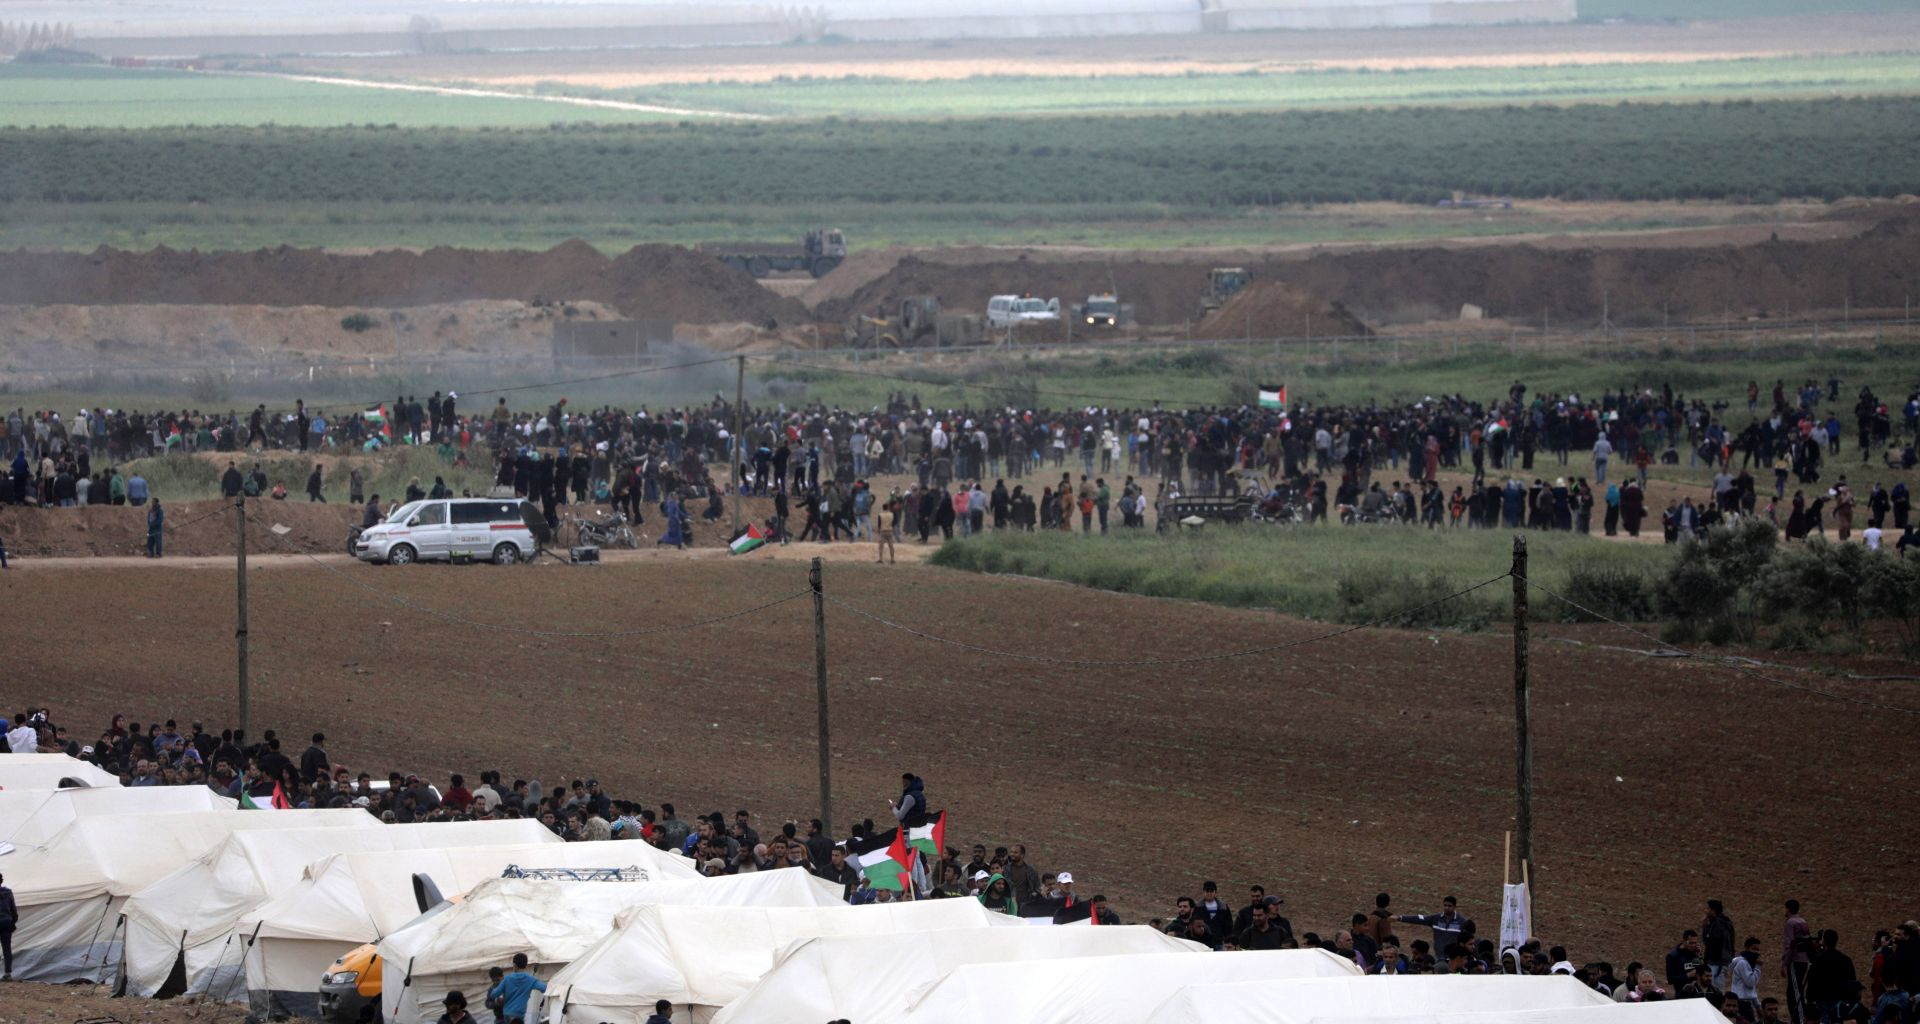 ZAPADNA OBALA Palestinac zaklao Izraelca